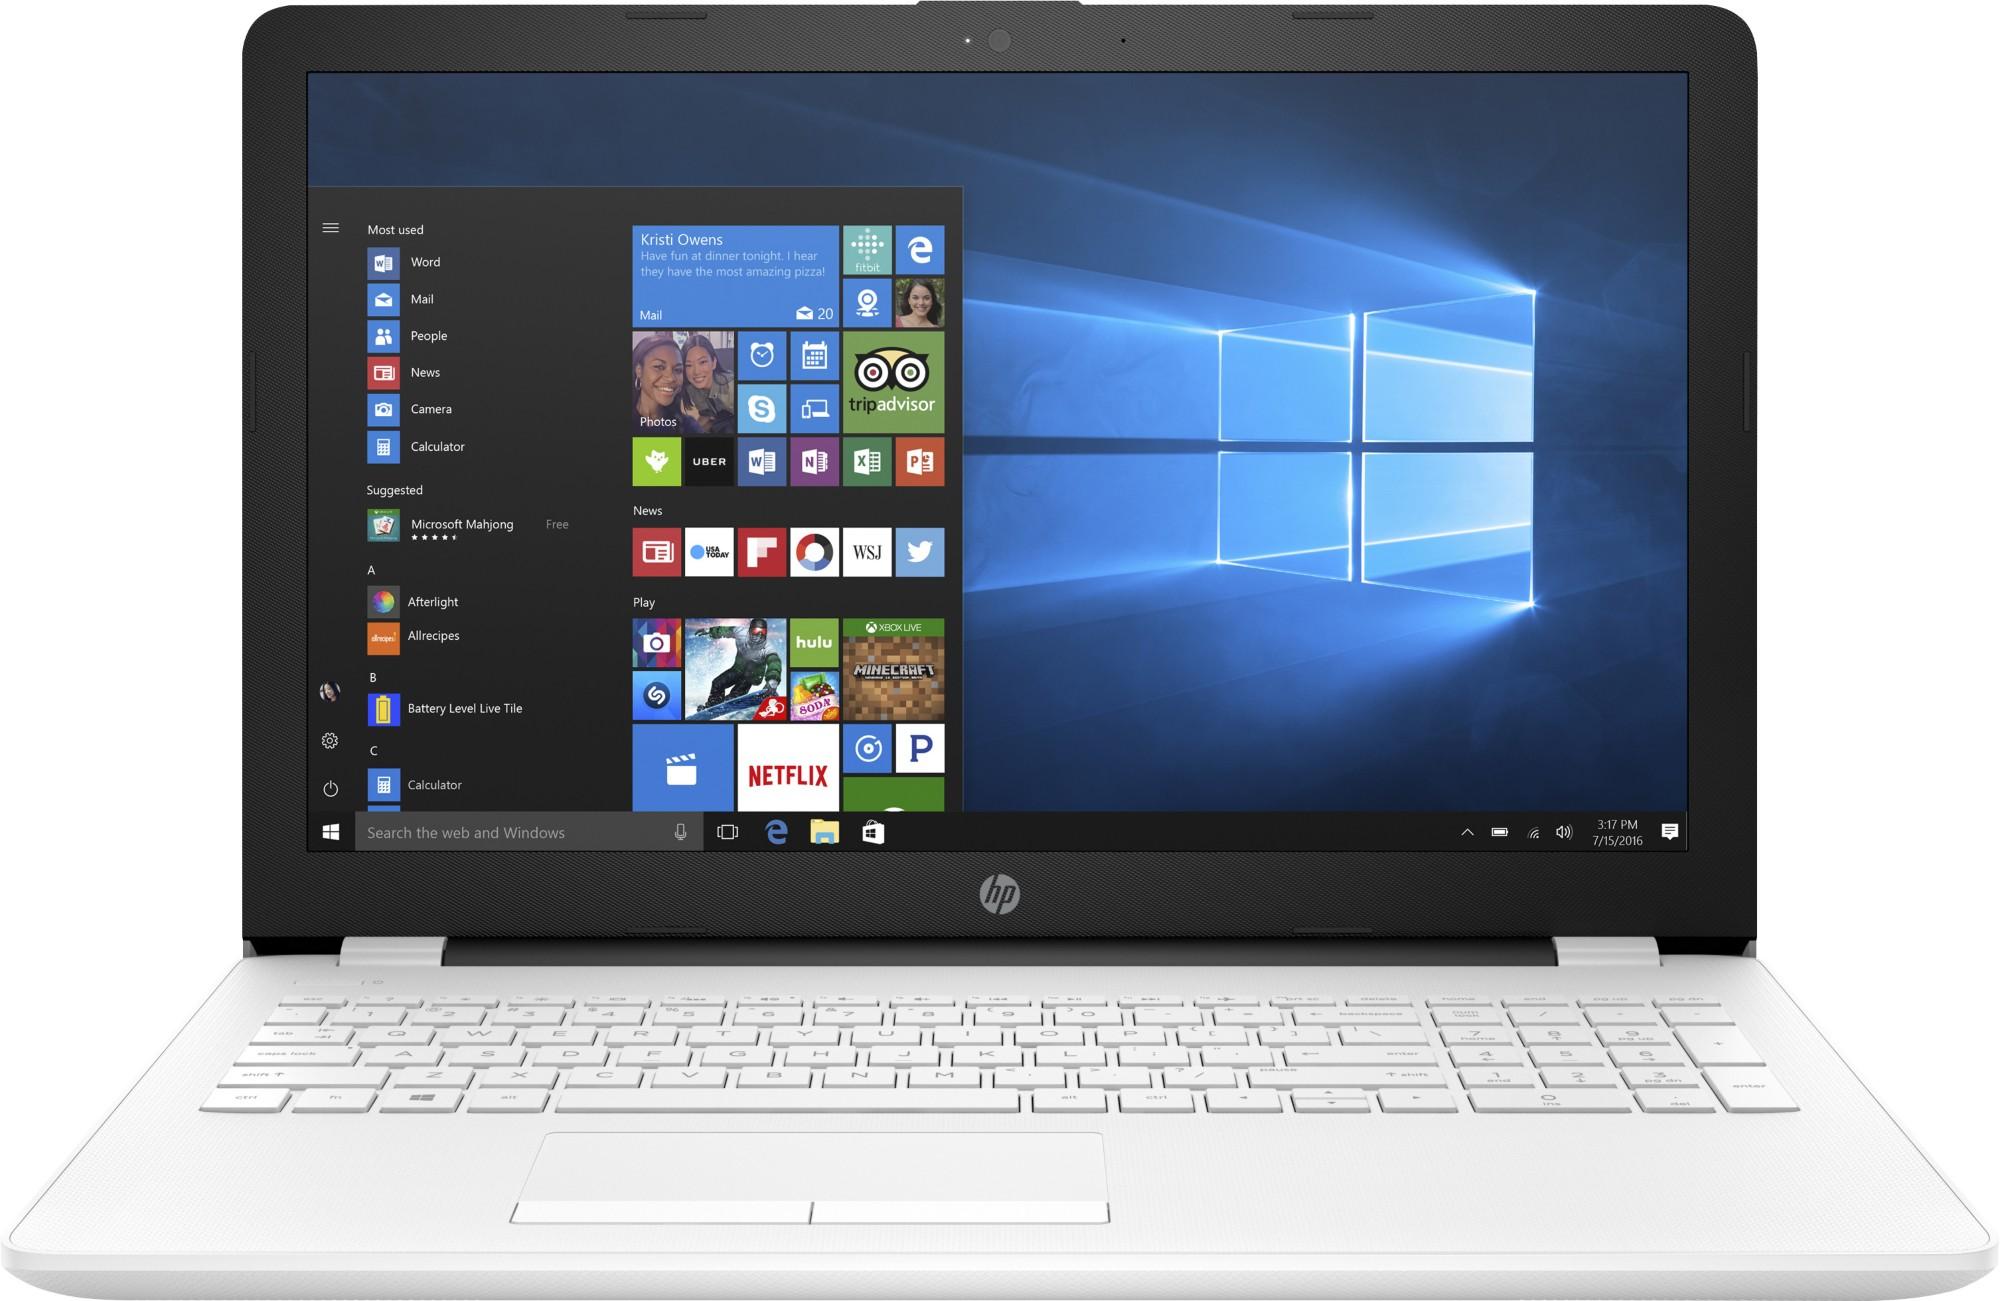 HP 15-bw085na 2HQ85EA#ABU AMD DC A9-9420 4GB 1TB 15.6IN BT CAM Win 10 Home Refurb